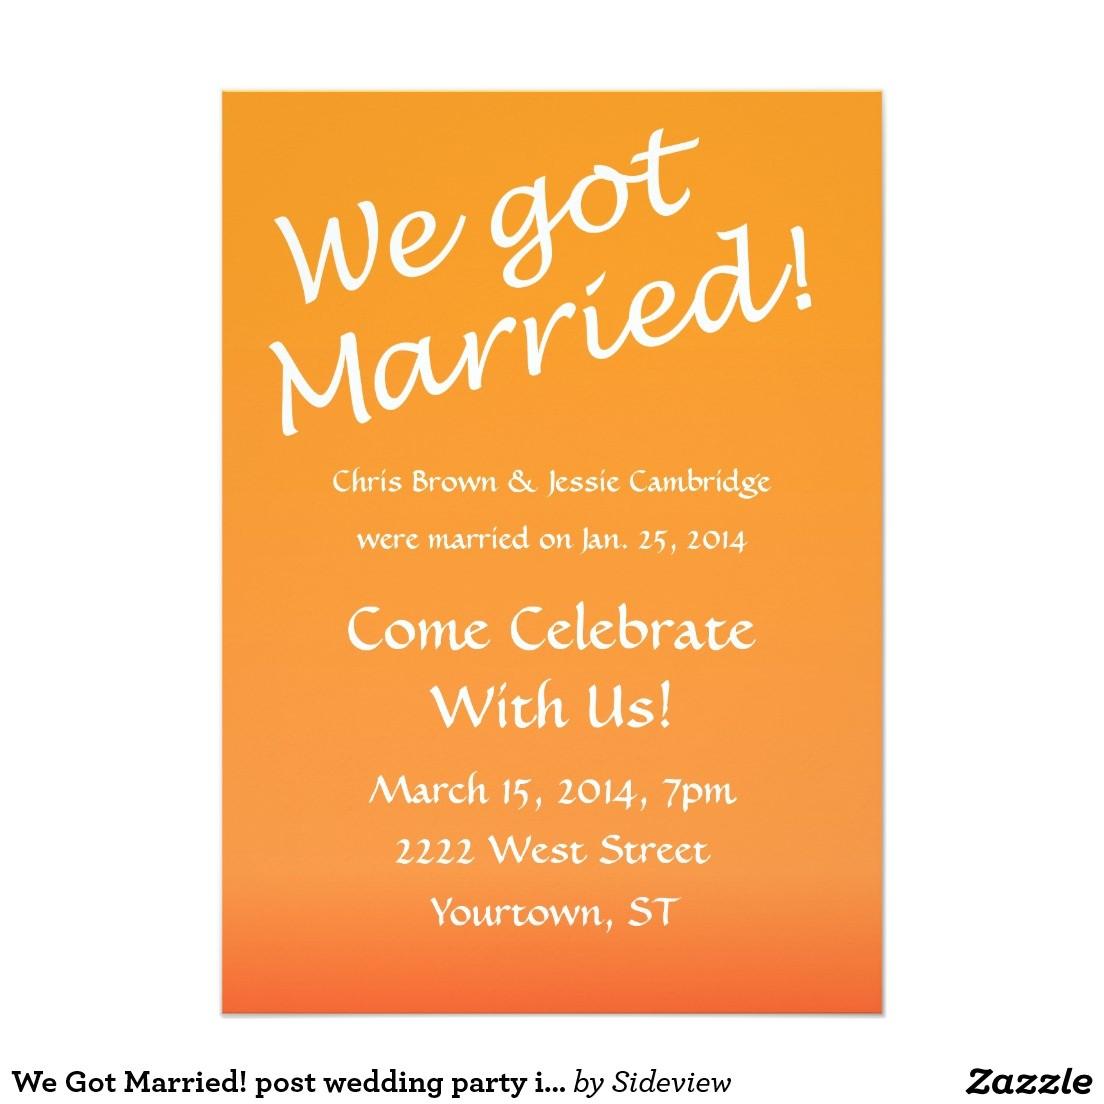 Marriage Celebration Party Invitations Post Wedding Reception Invitation Wording